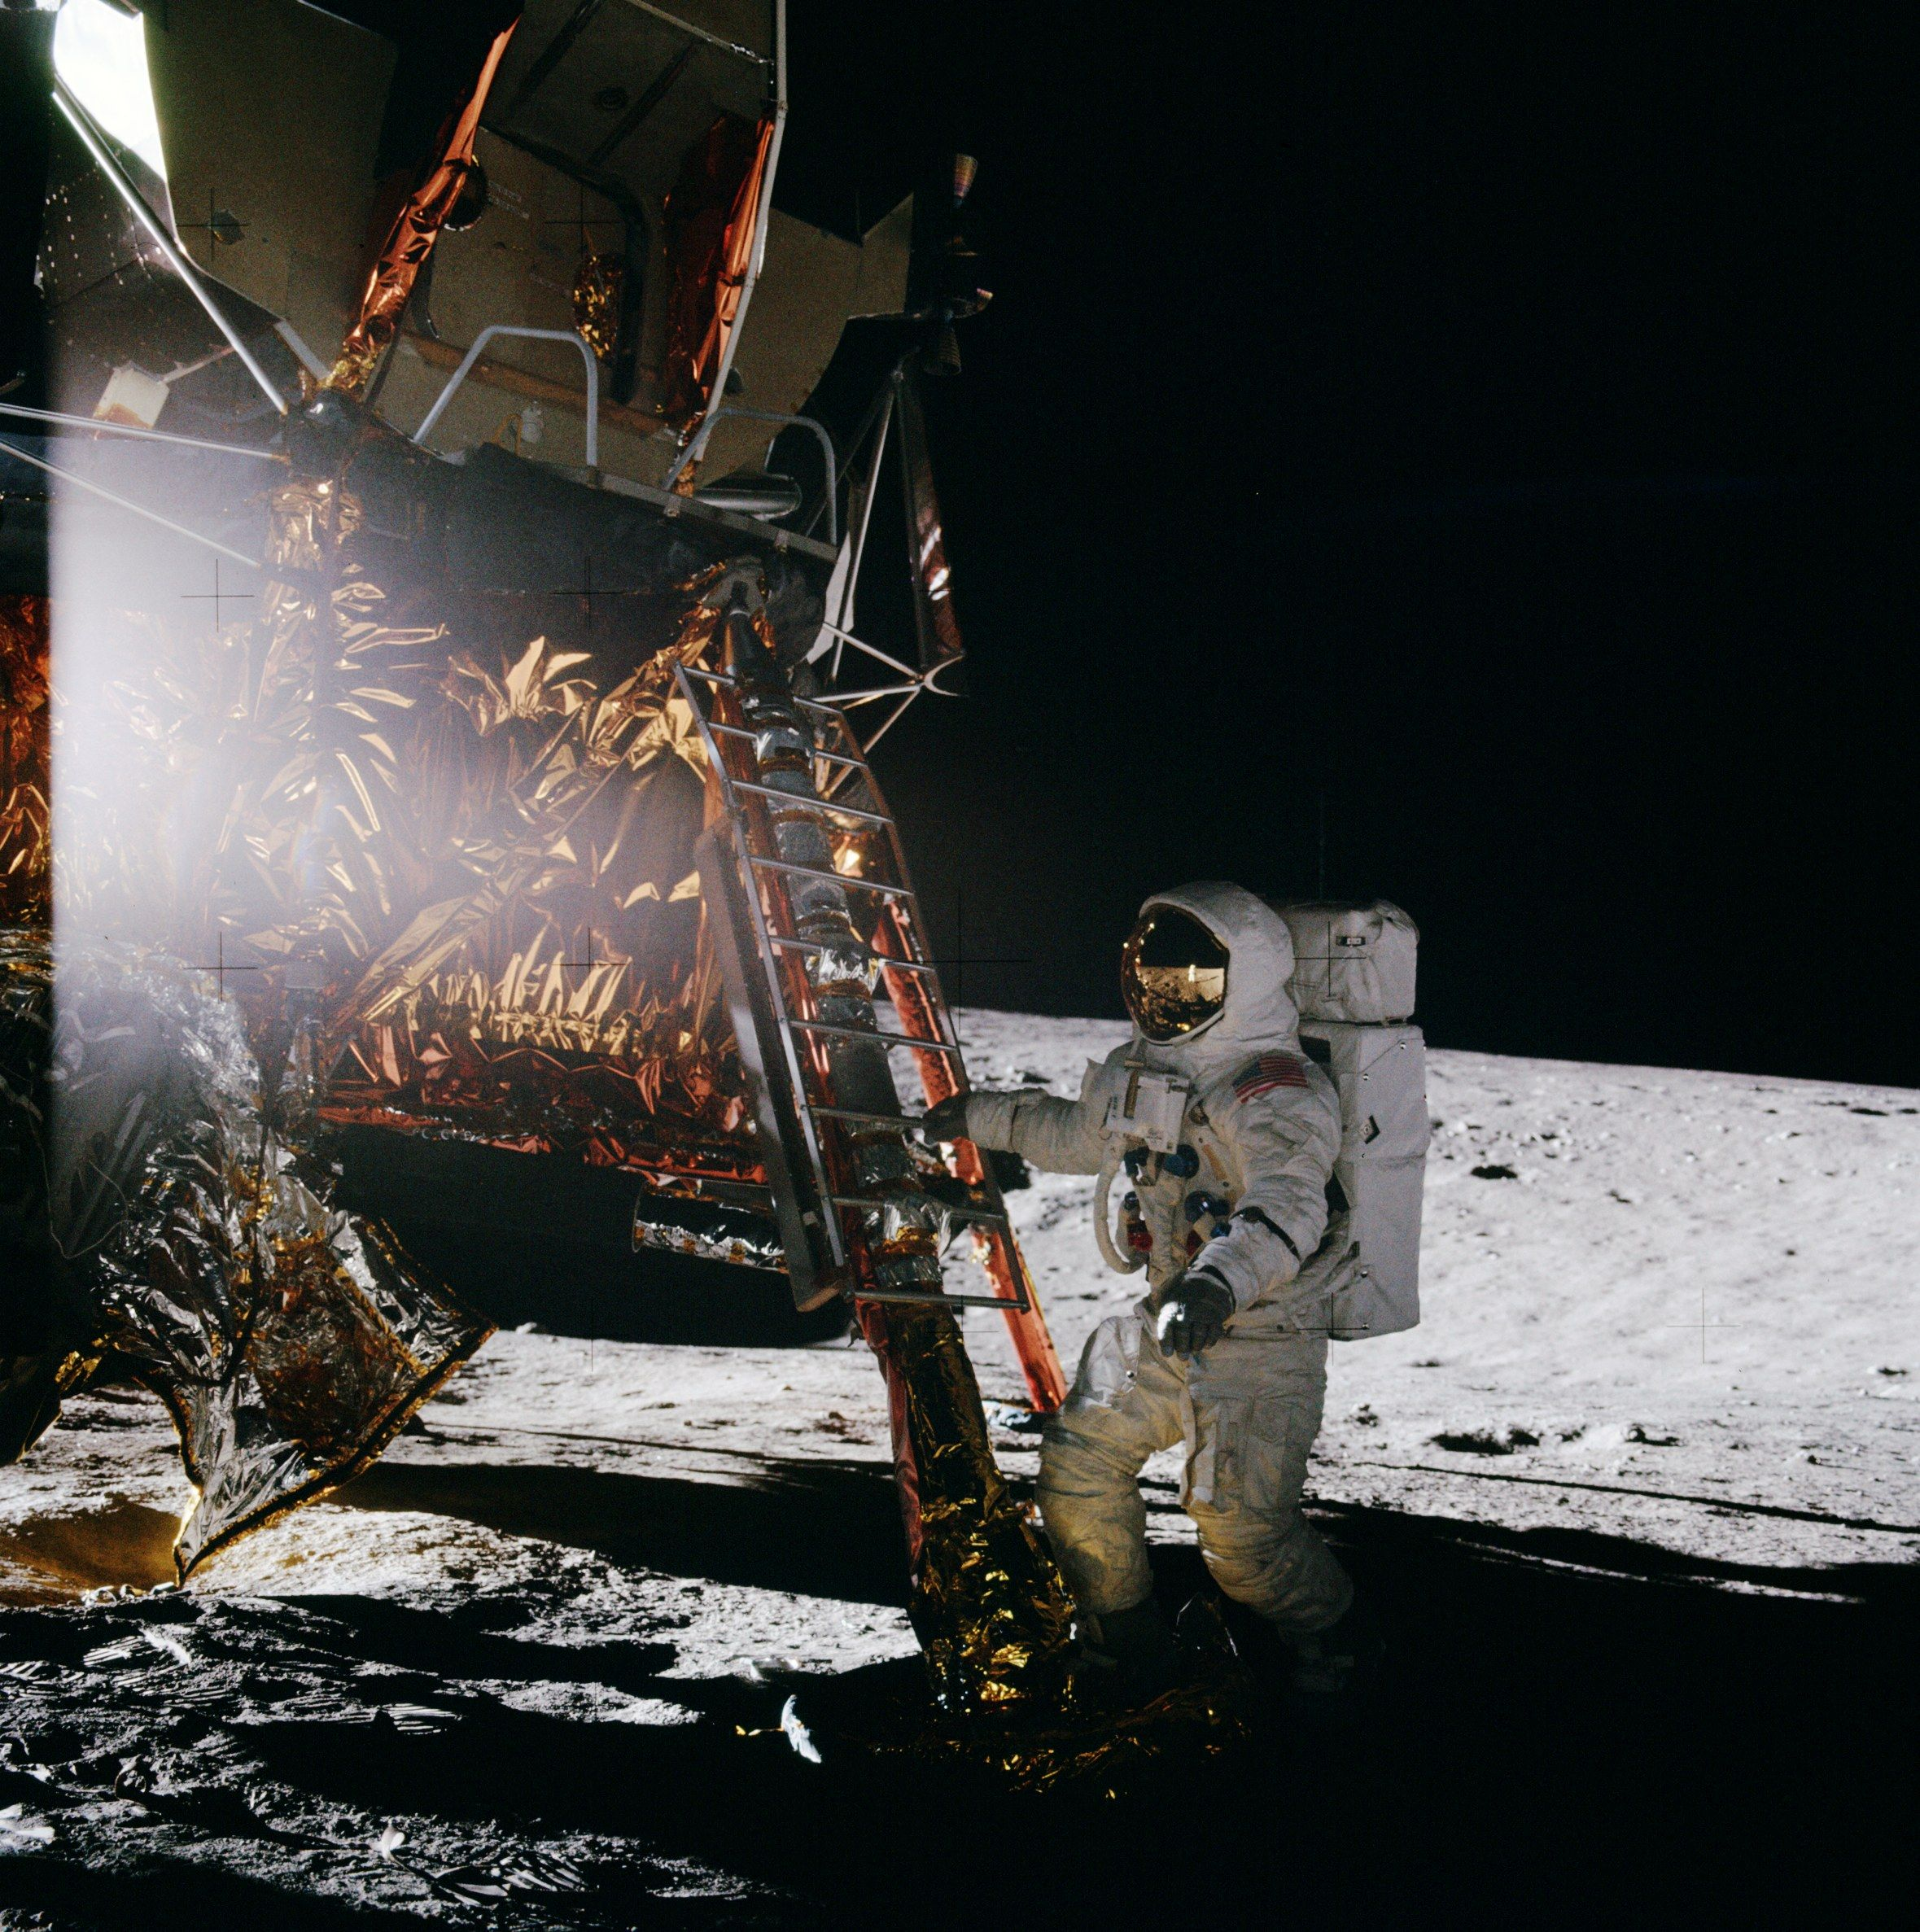 Apollo_12_Al_Bean_stepping_on_moon.jpg (2359×2374)